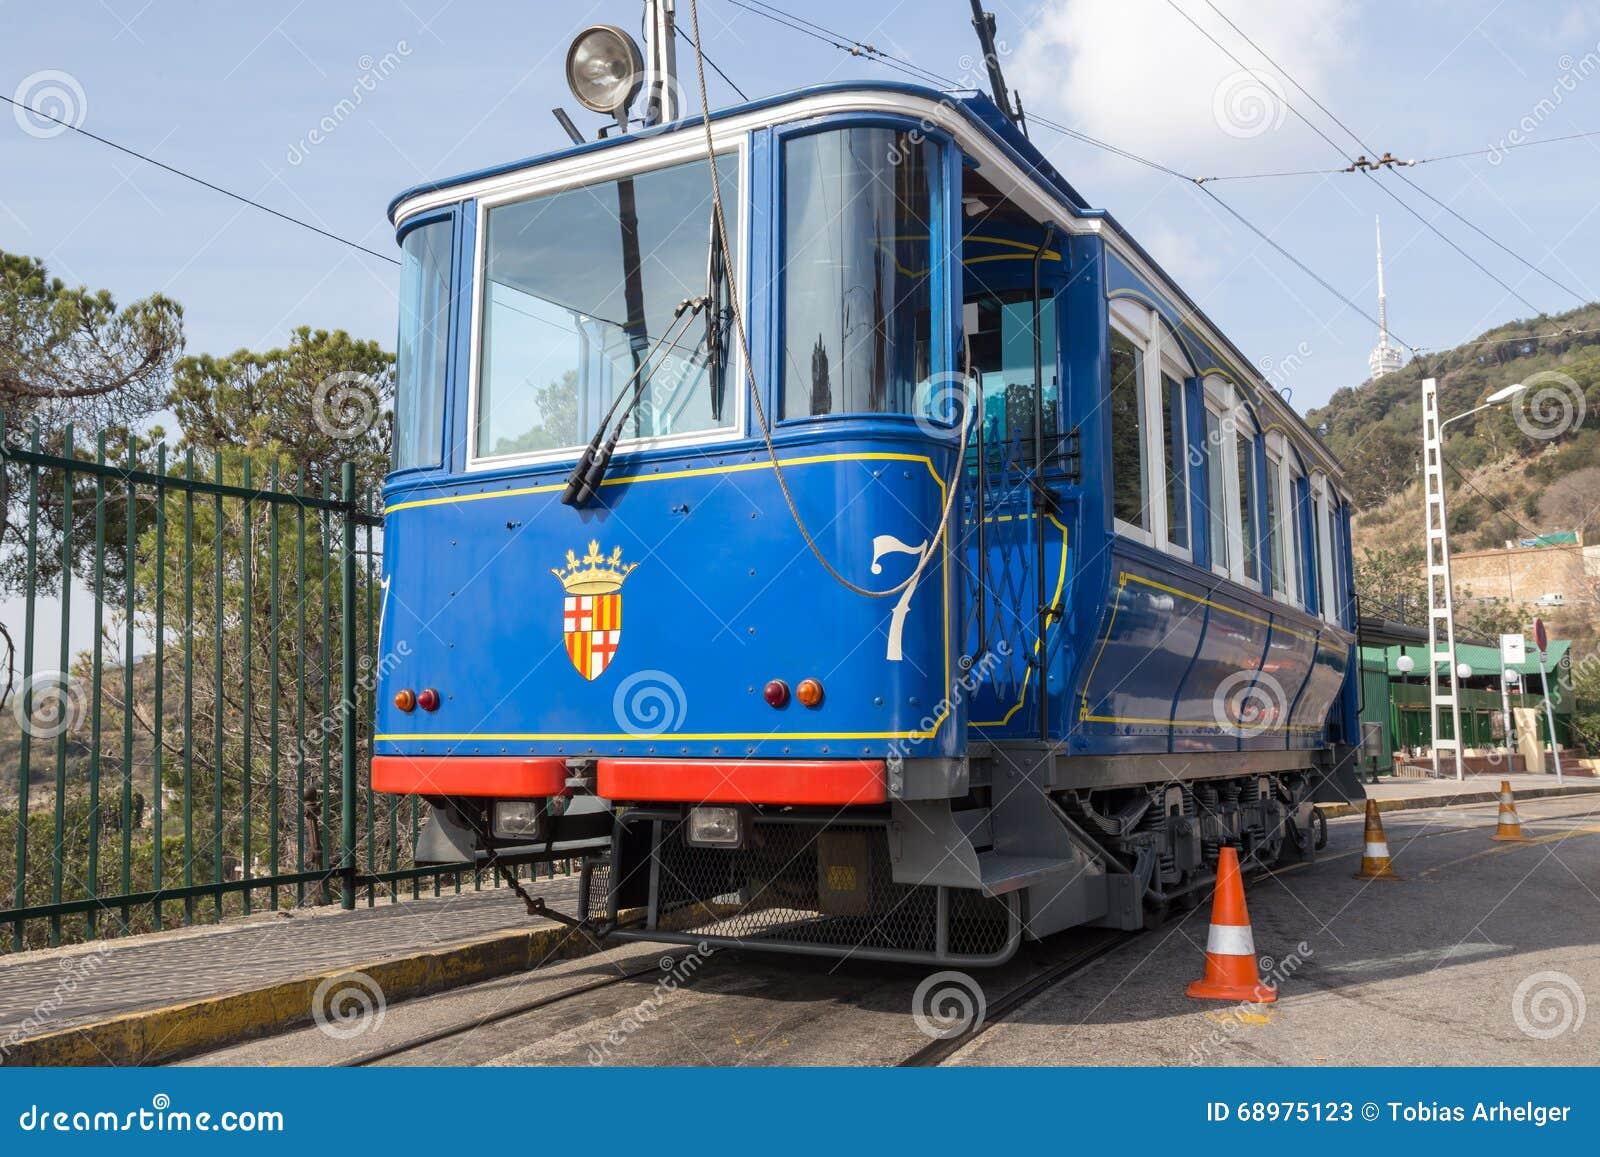 tramvia blau cable car barcelona spain